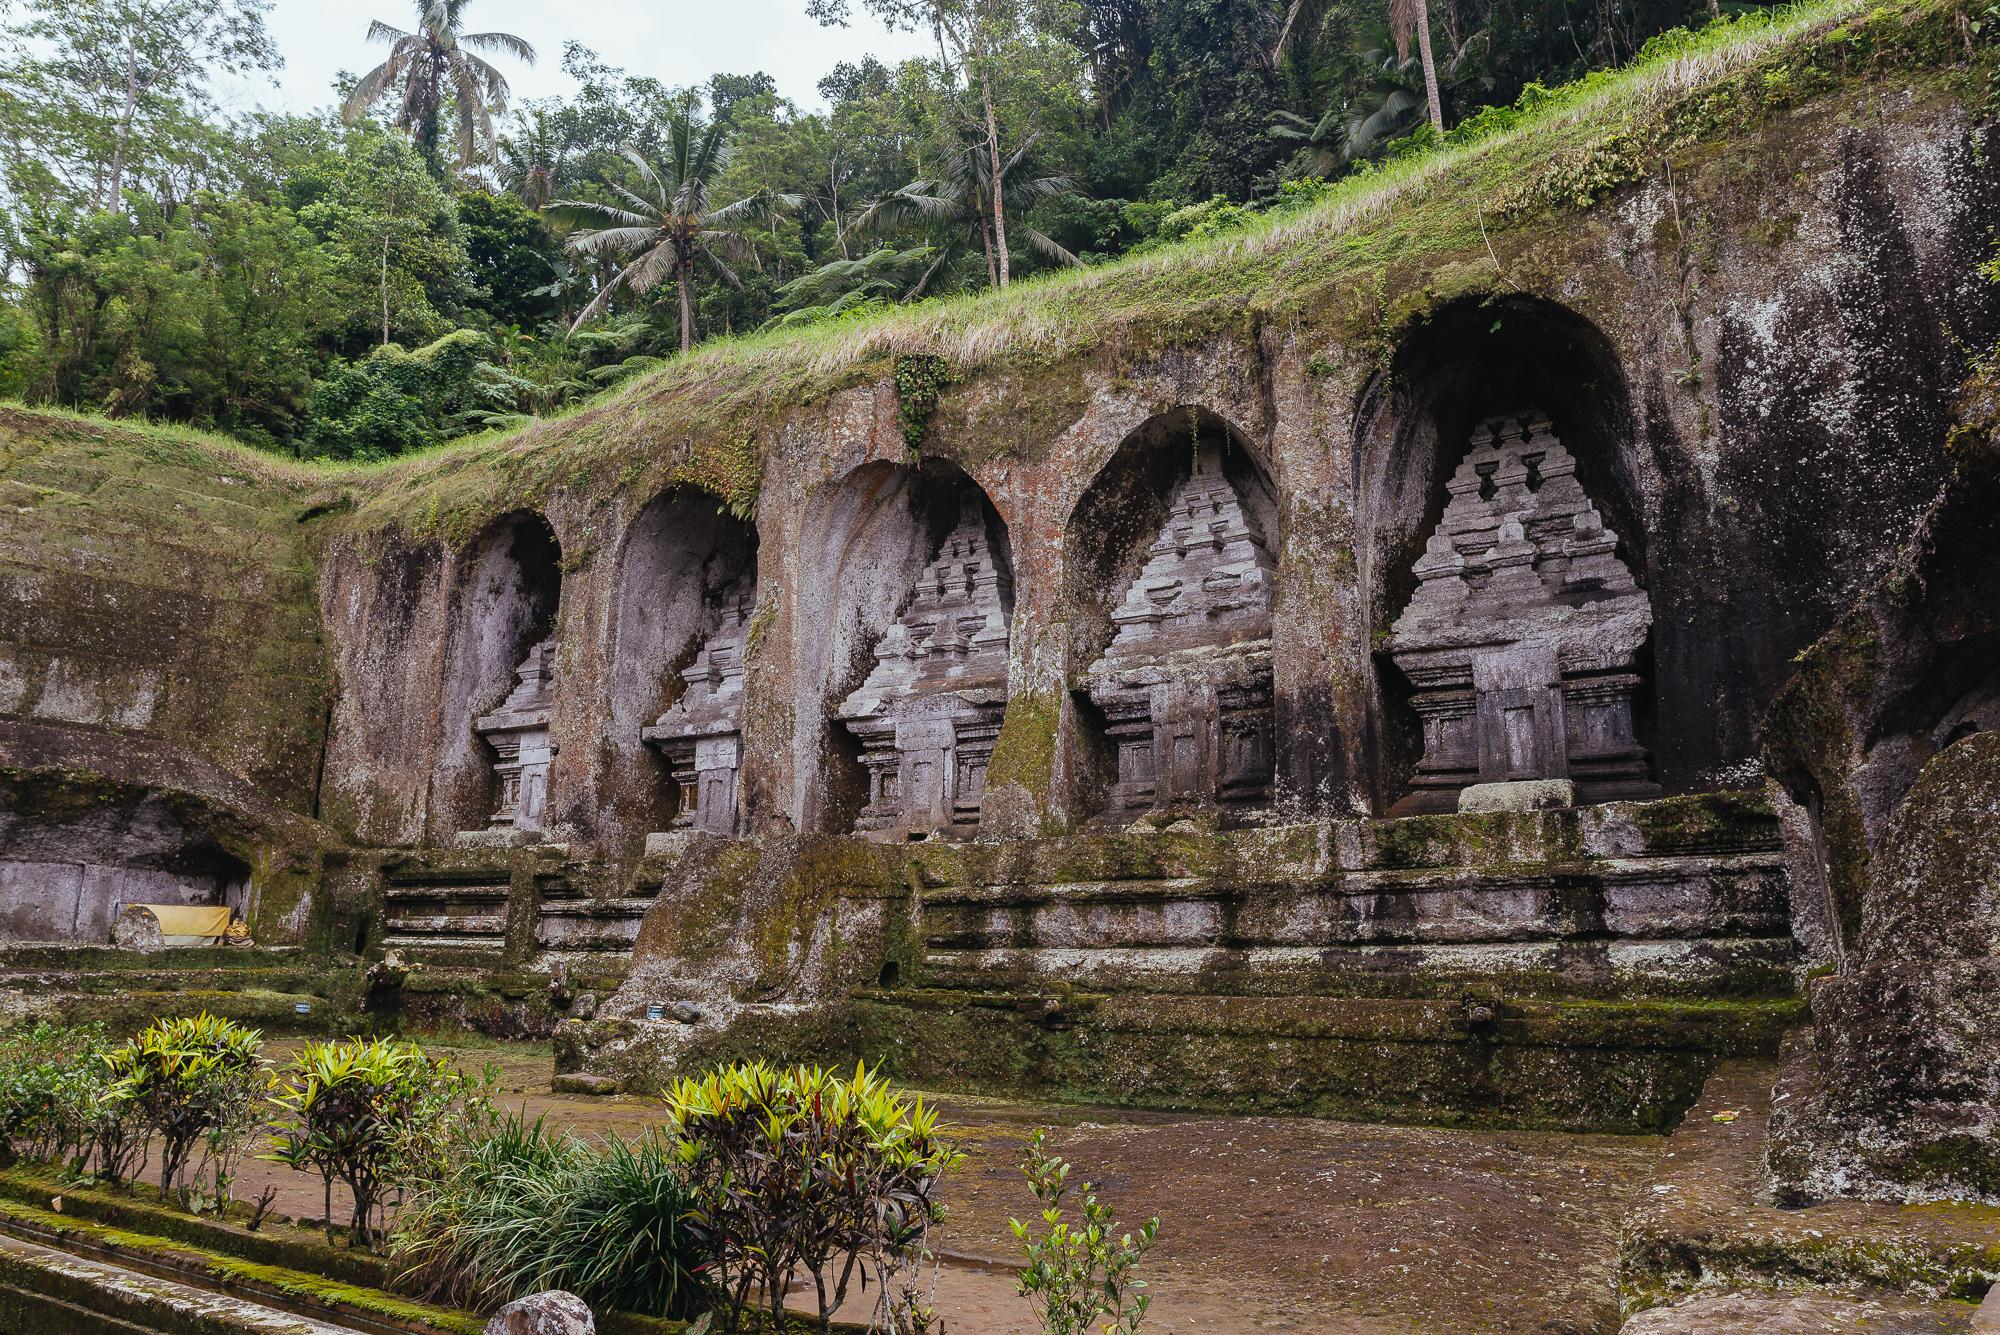 indonesia_2017-371.jpg